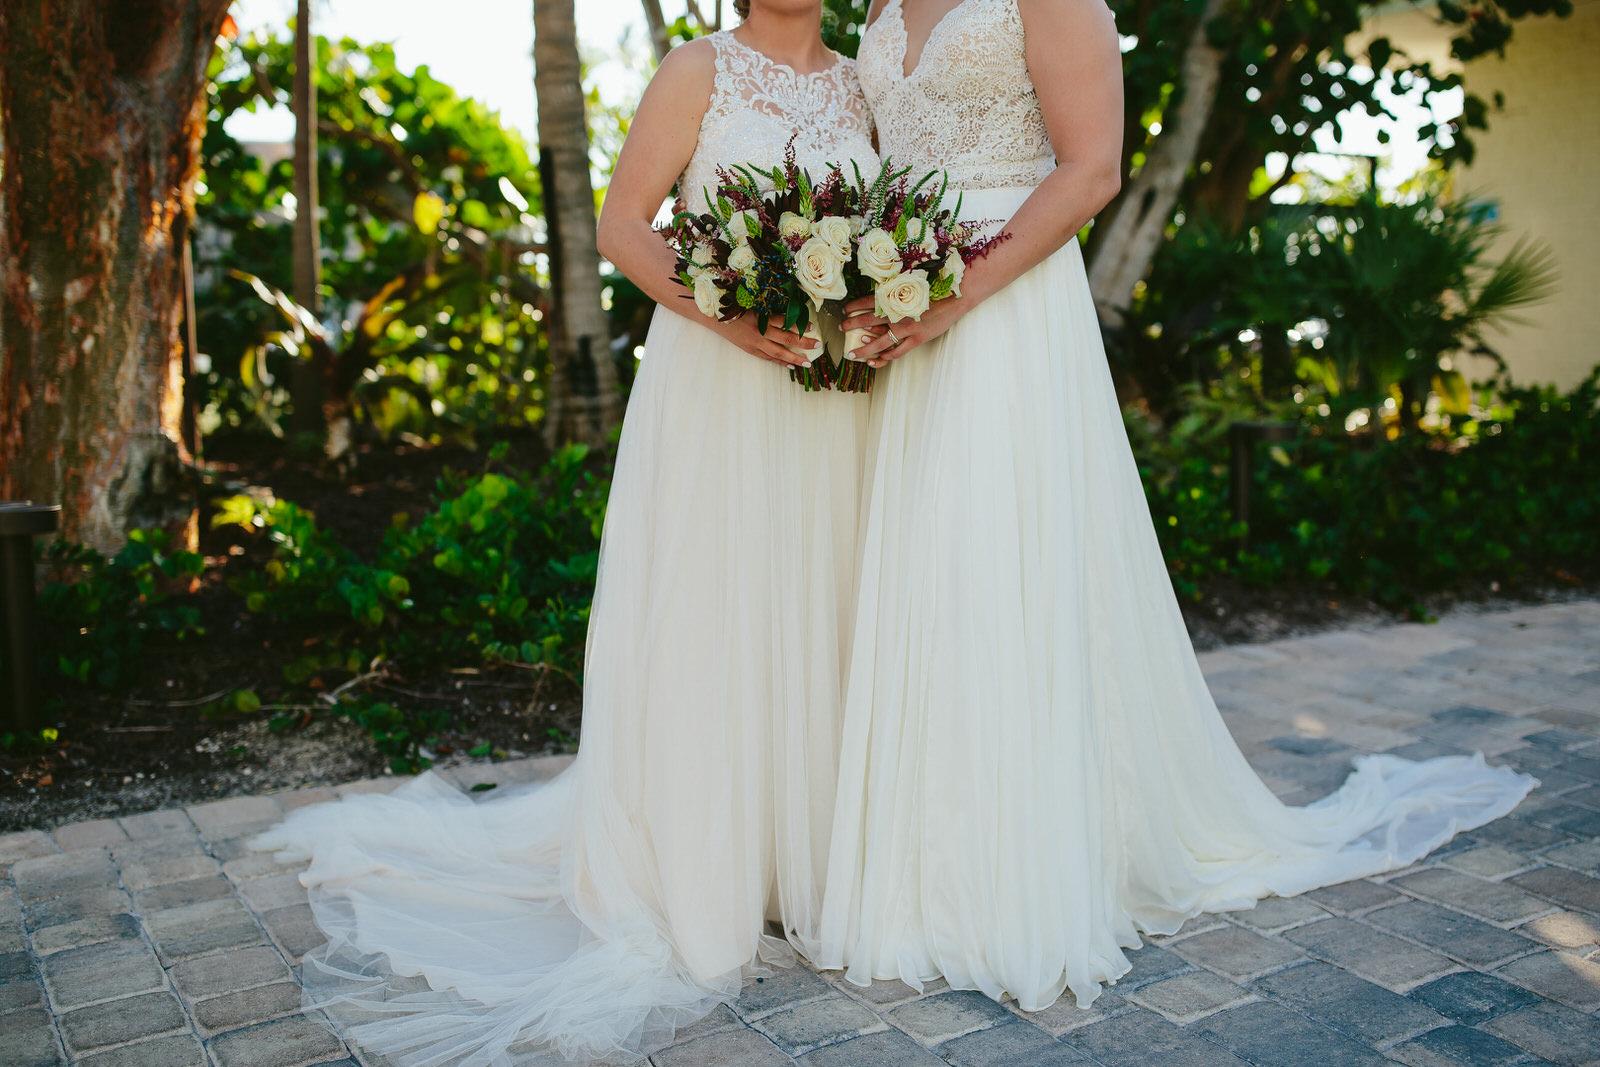 lgbtq_wedding_photographer_bouquet_brides.jpg